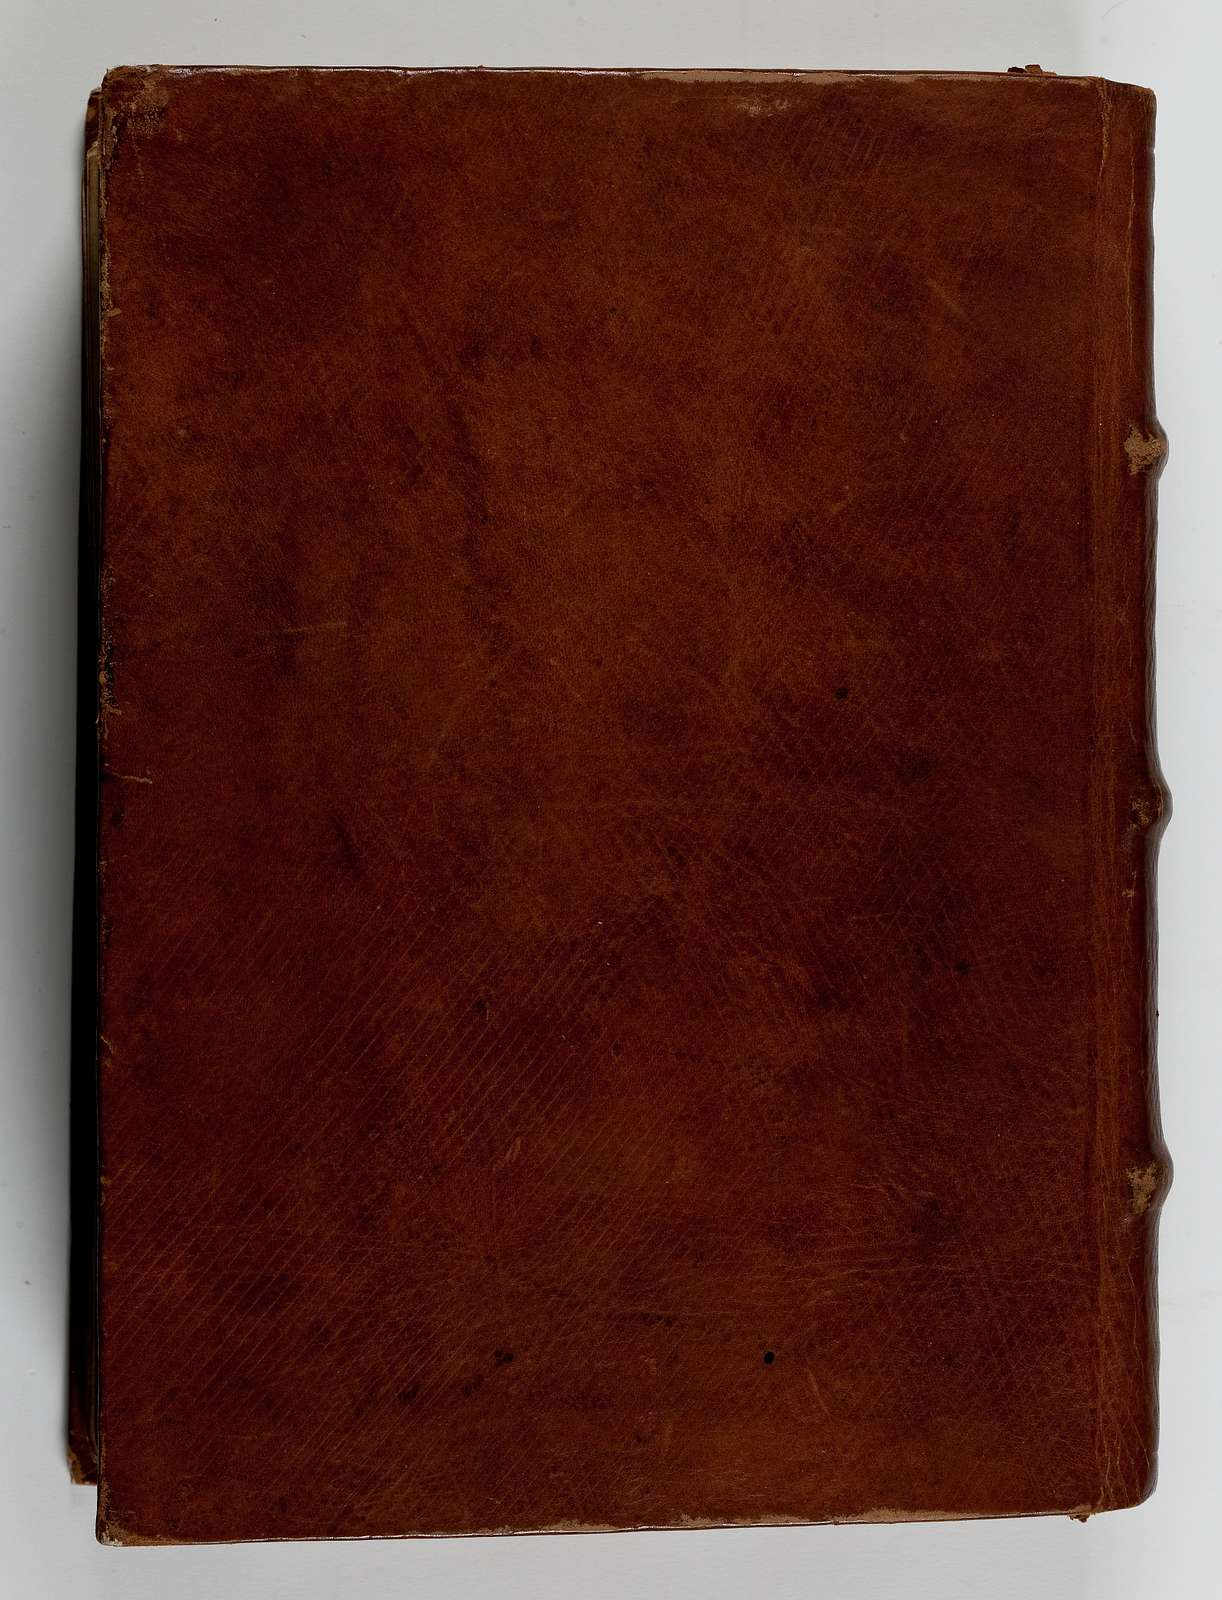 Don Ferrante Maḥzor, Volume 1